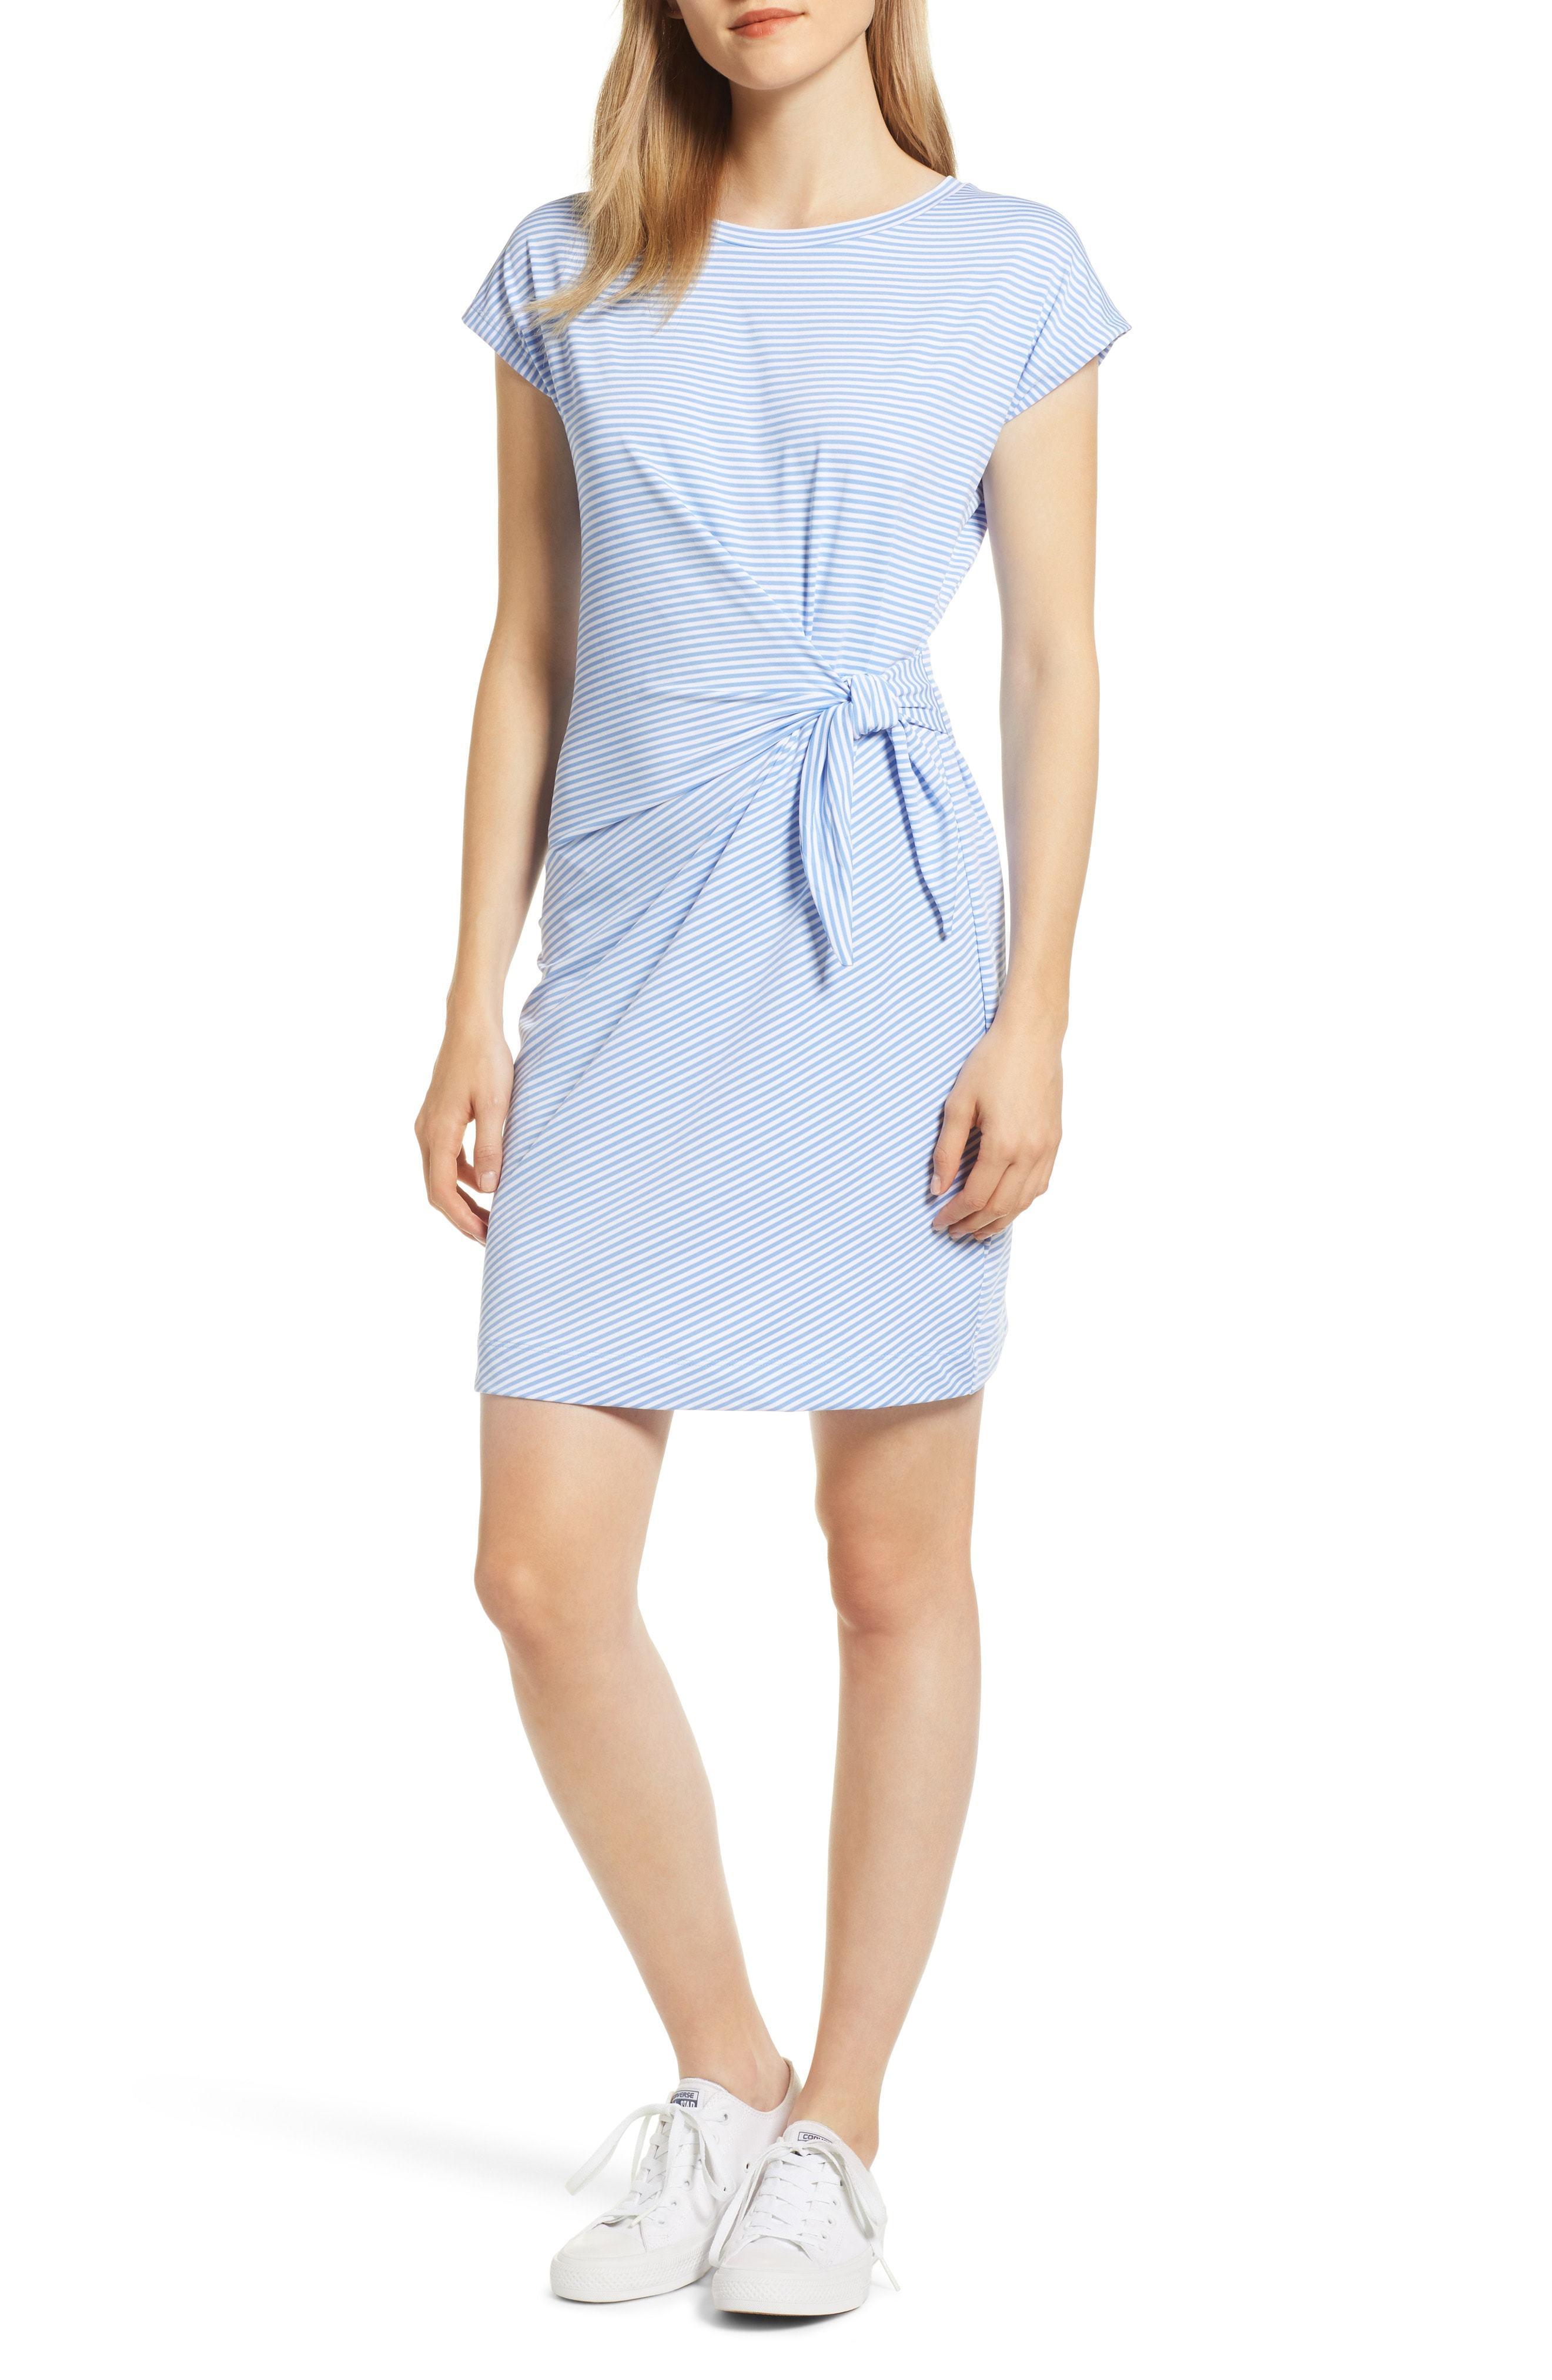 Vineyard Vines Sankaty Side Tie Stretch Knit Dress